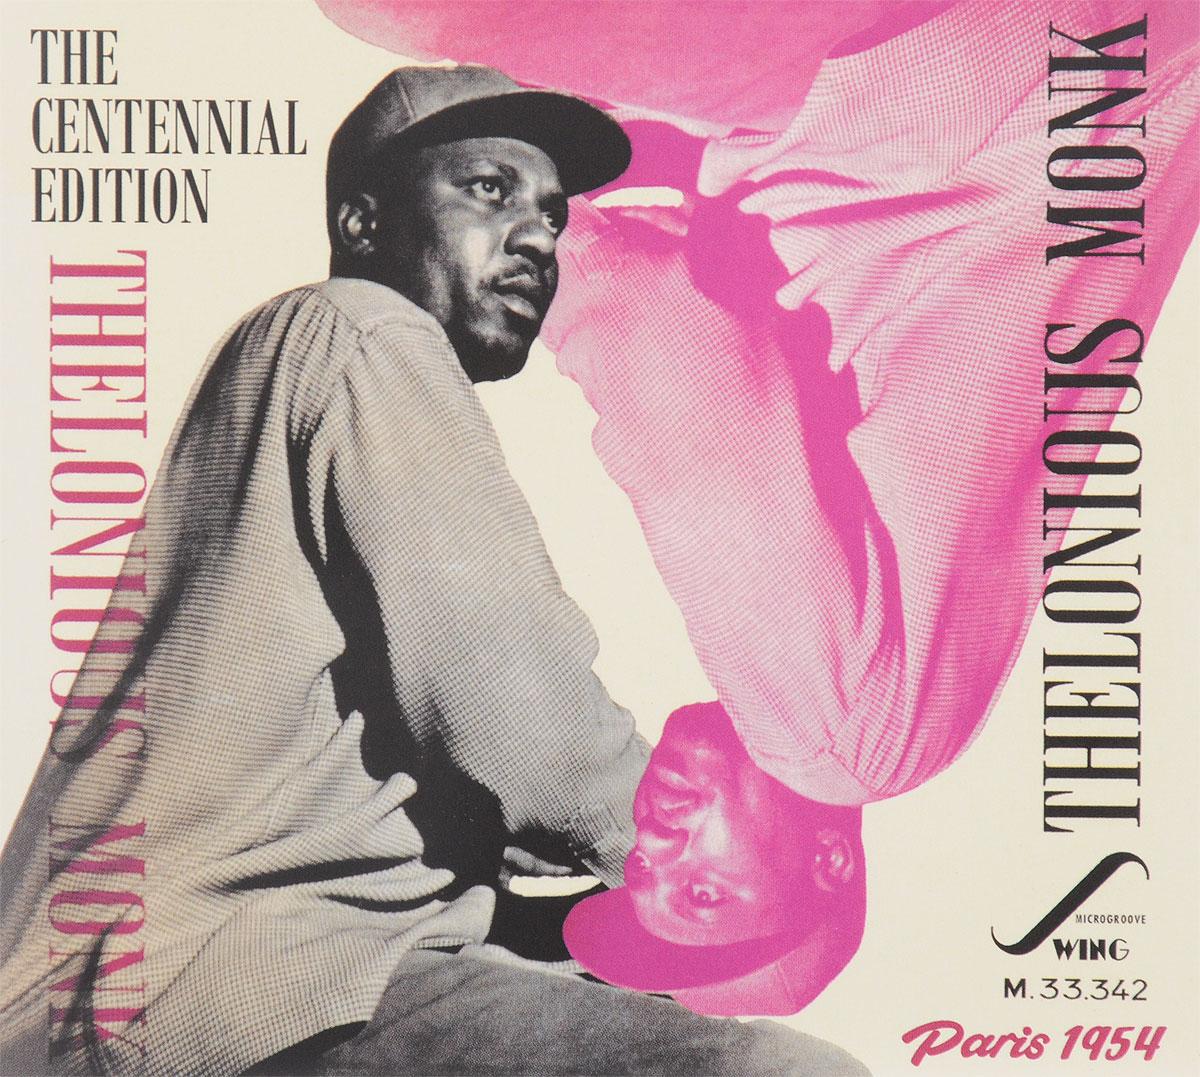 Телониус Монк Thelonious Monk. Piano Solo. The Centennial Edition roxy music roxy music the studio albums limited edition 8 lp